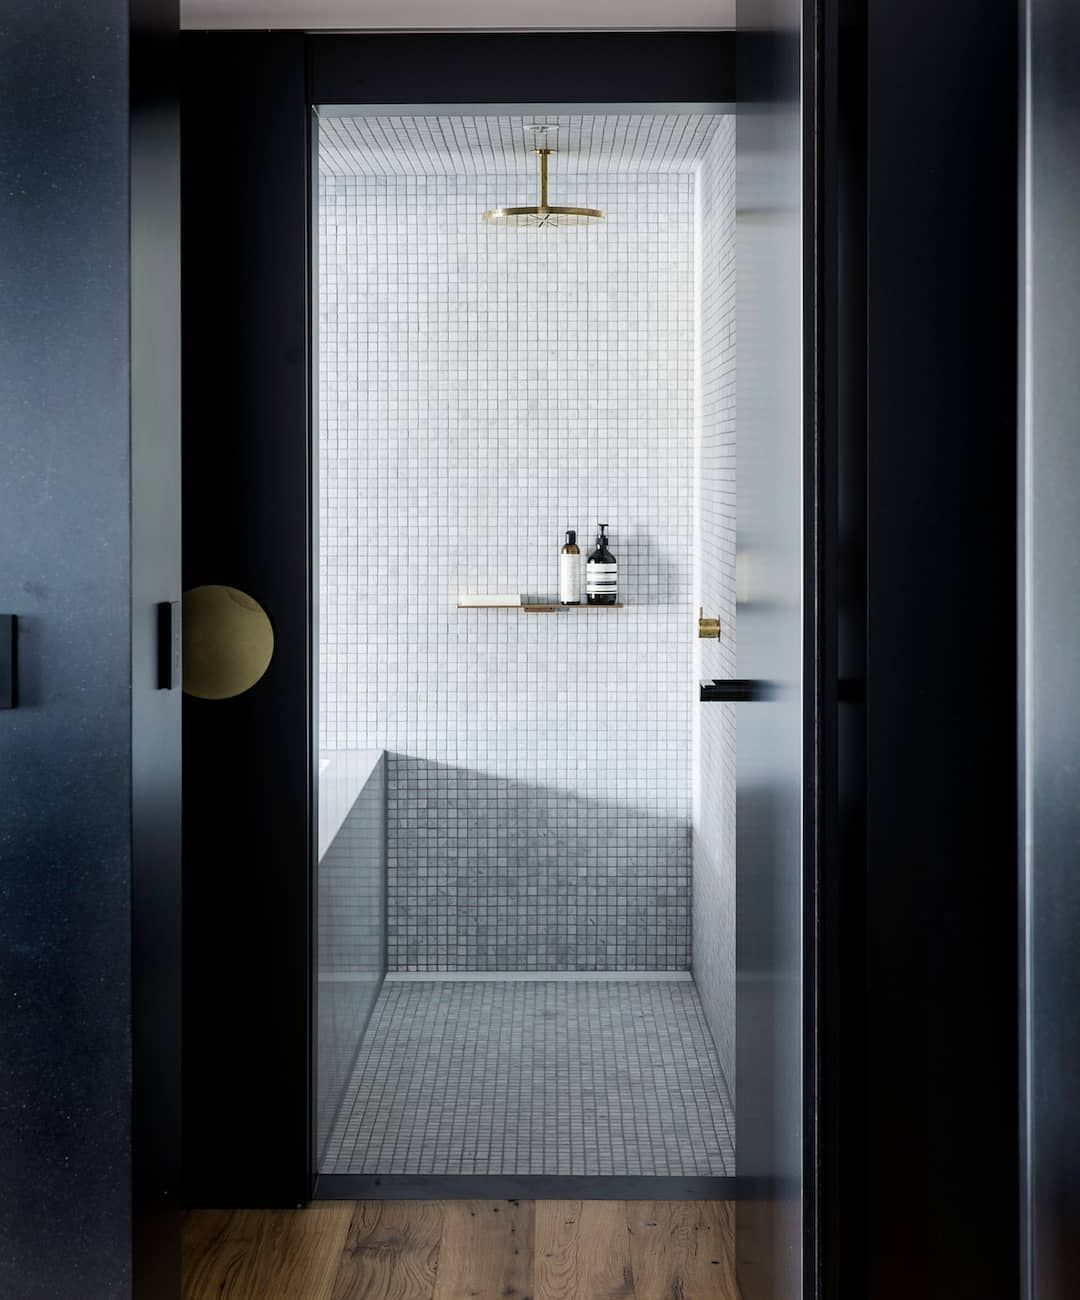 1 928 Likes 10 Comments Unforgettable Spaces Amp Design Est Living On Instagram Bathroom